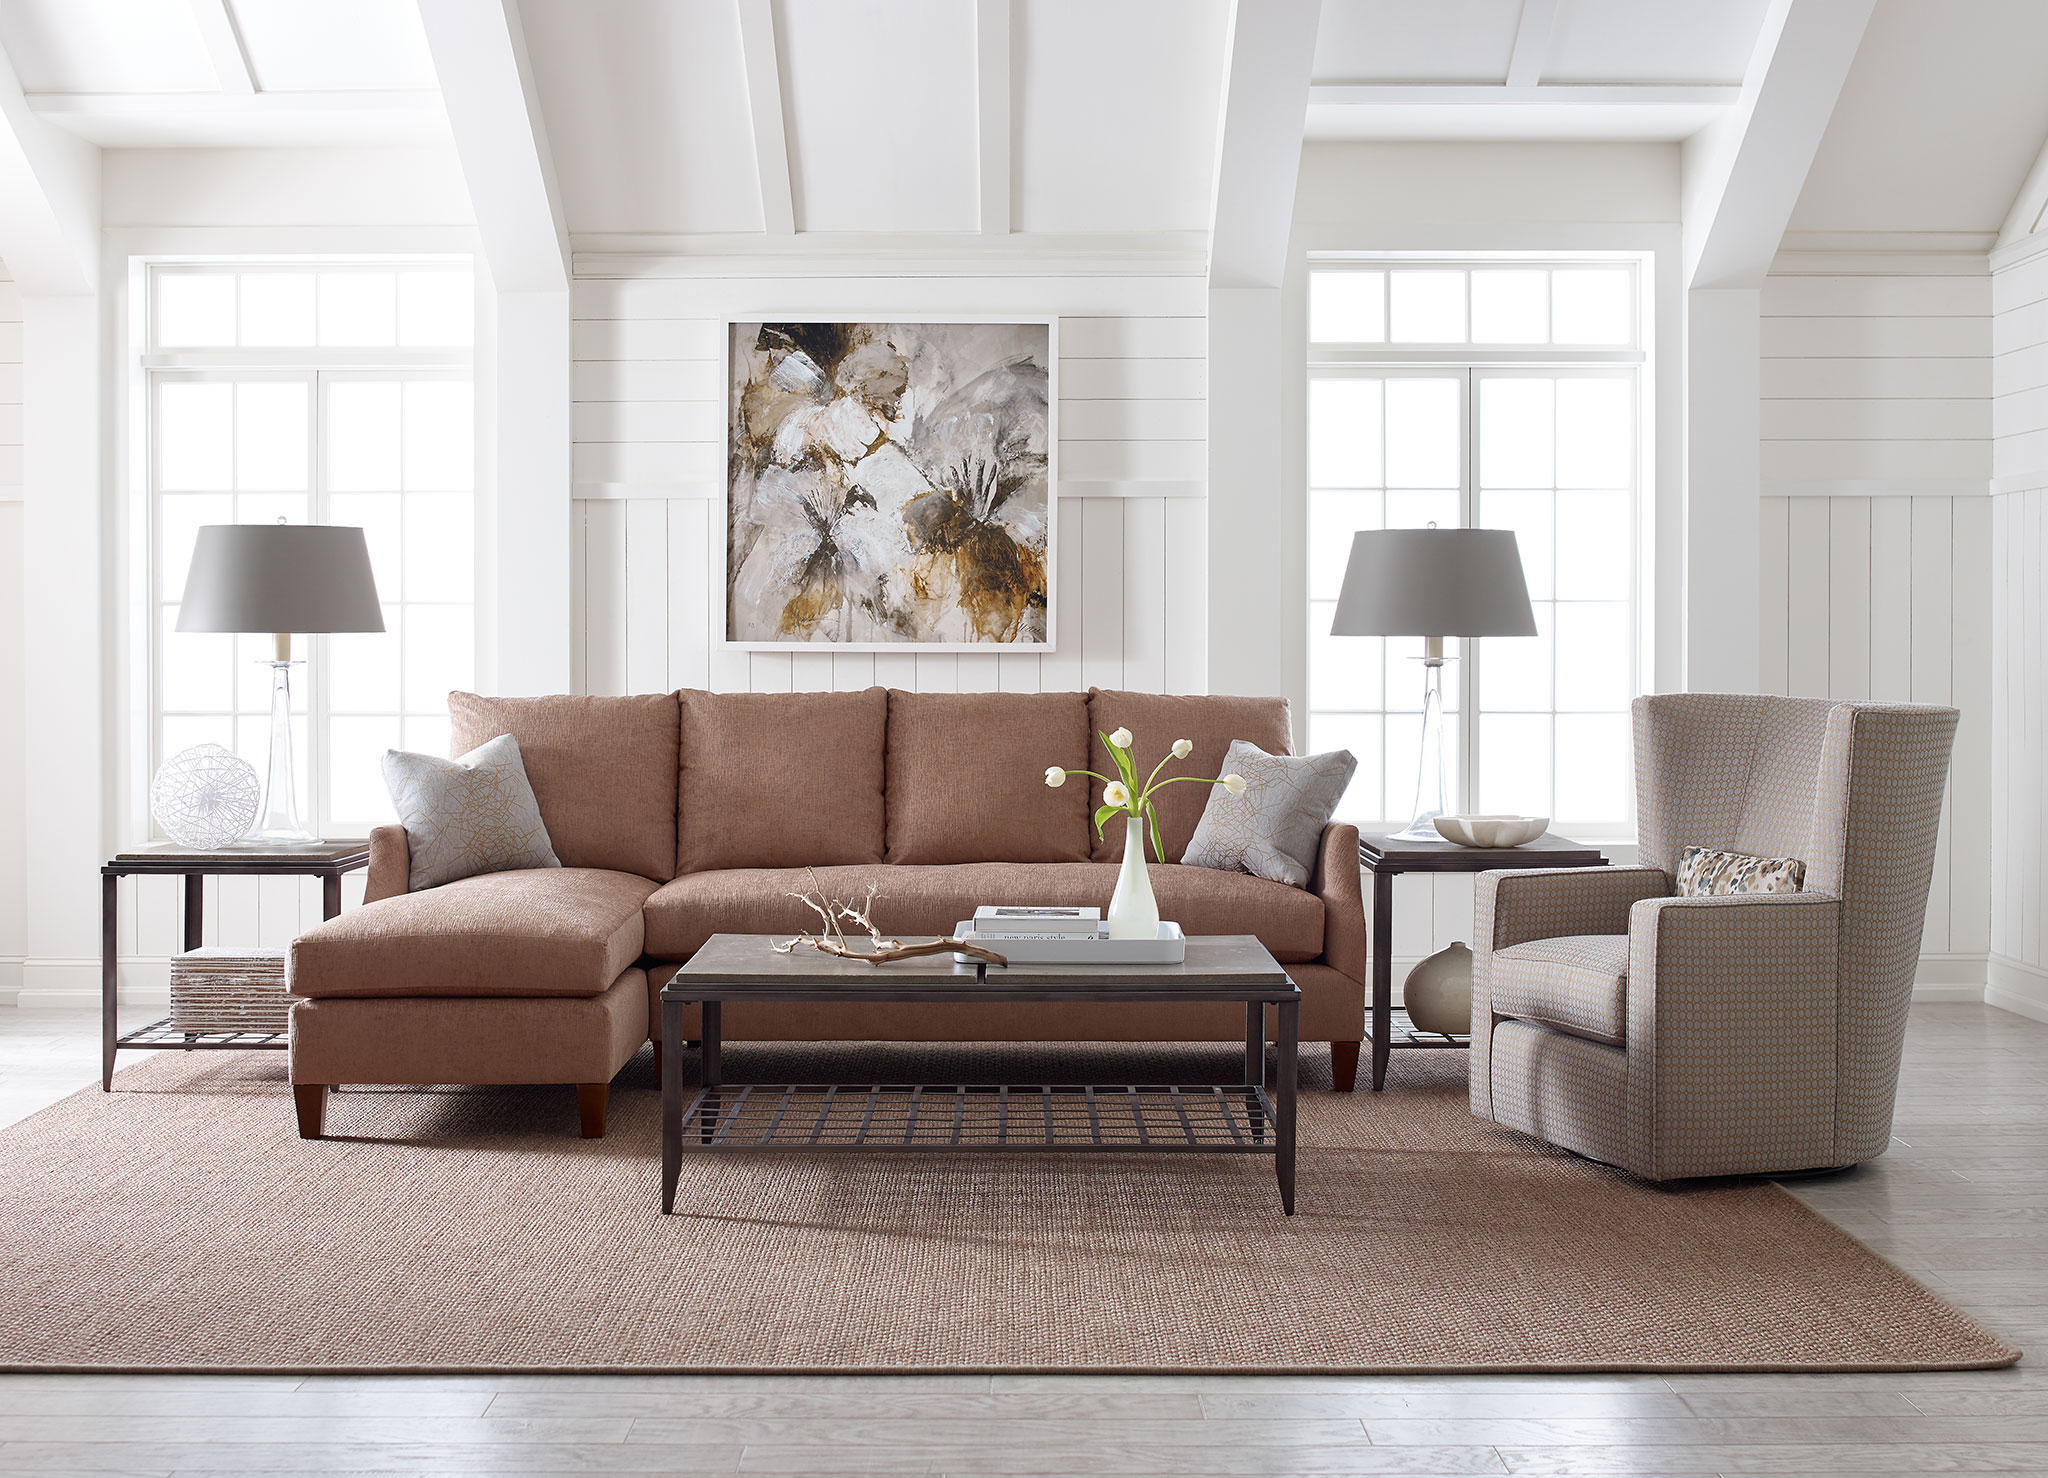 tips for decorating chattanooga living room furniture sectionals e f brannon furniture. Black Bedroom Furniture Sets. Home Design Ideas